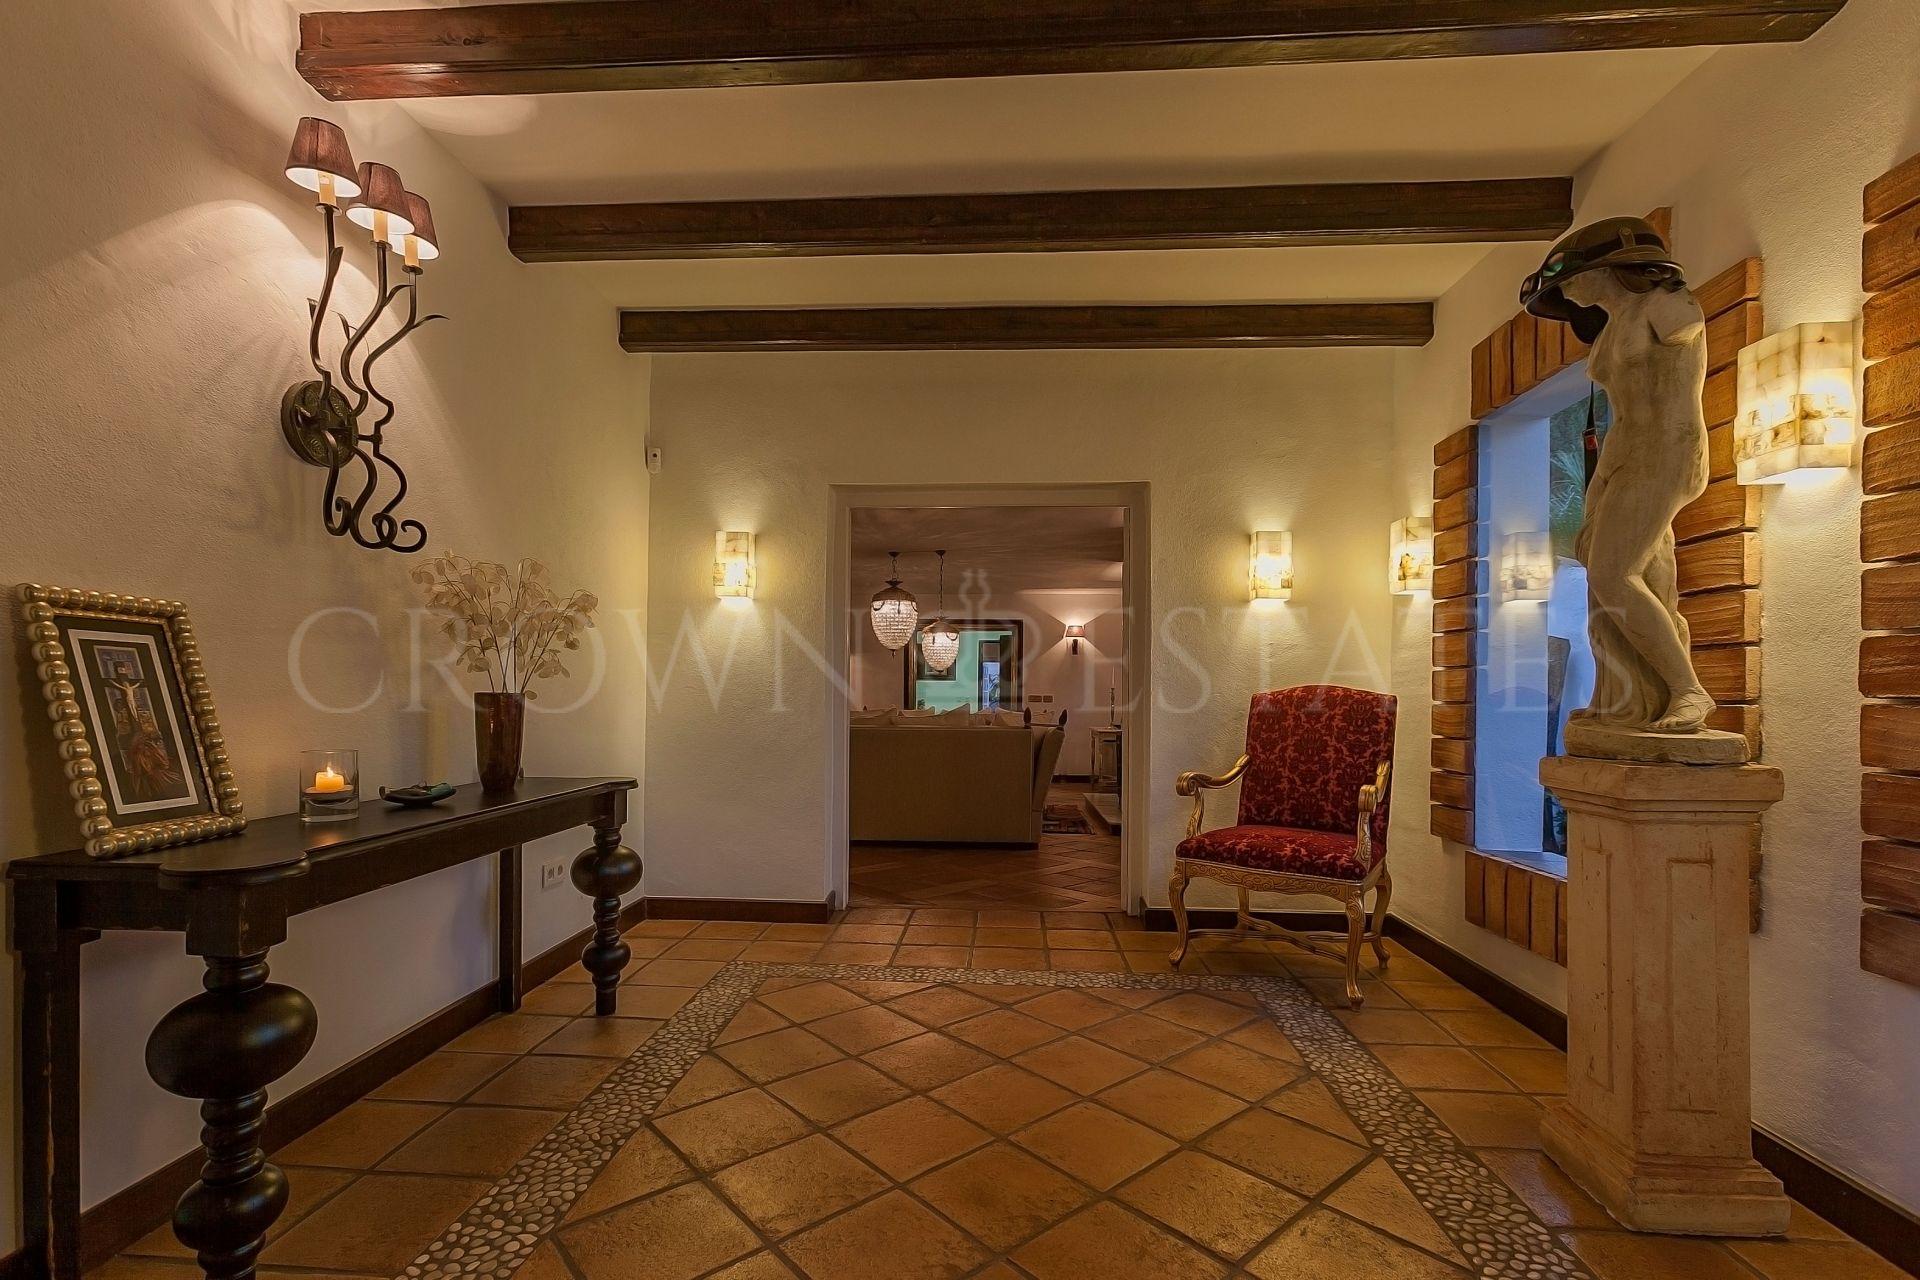 Villa for sale in Cortijo Blanco, San Pedro de Alcantara